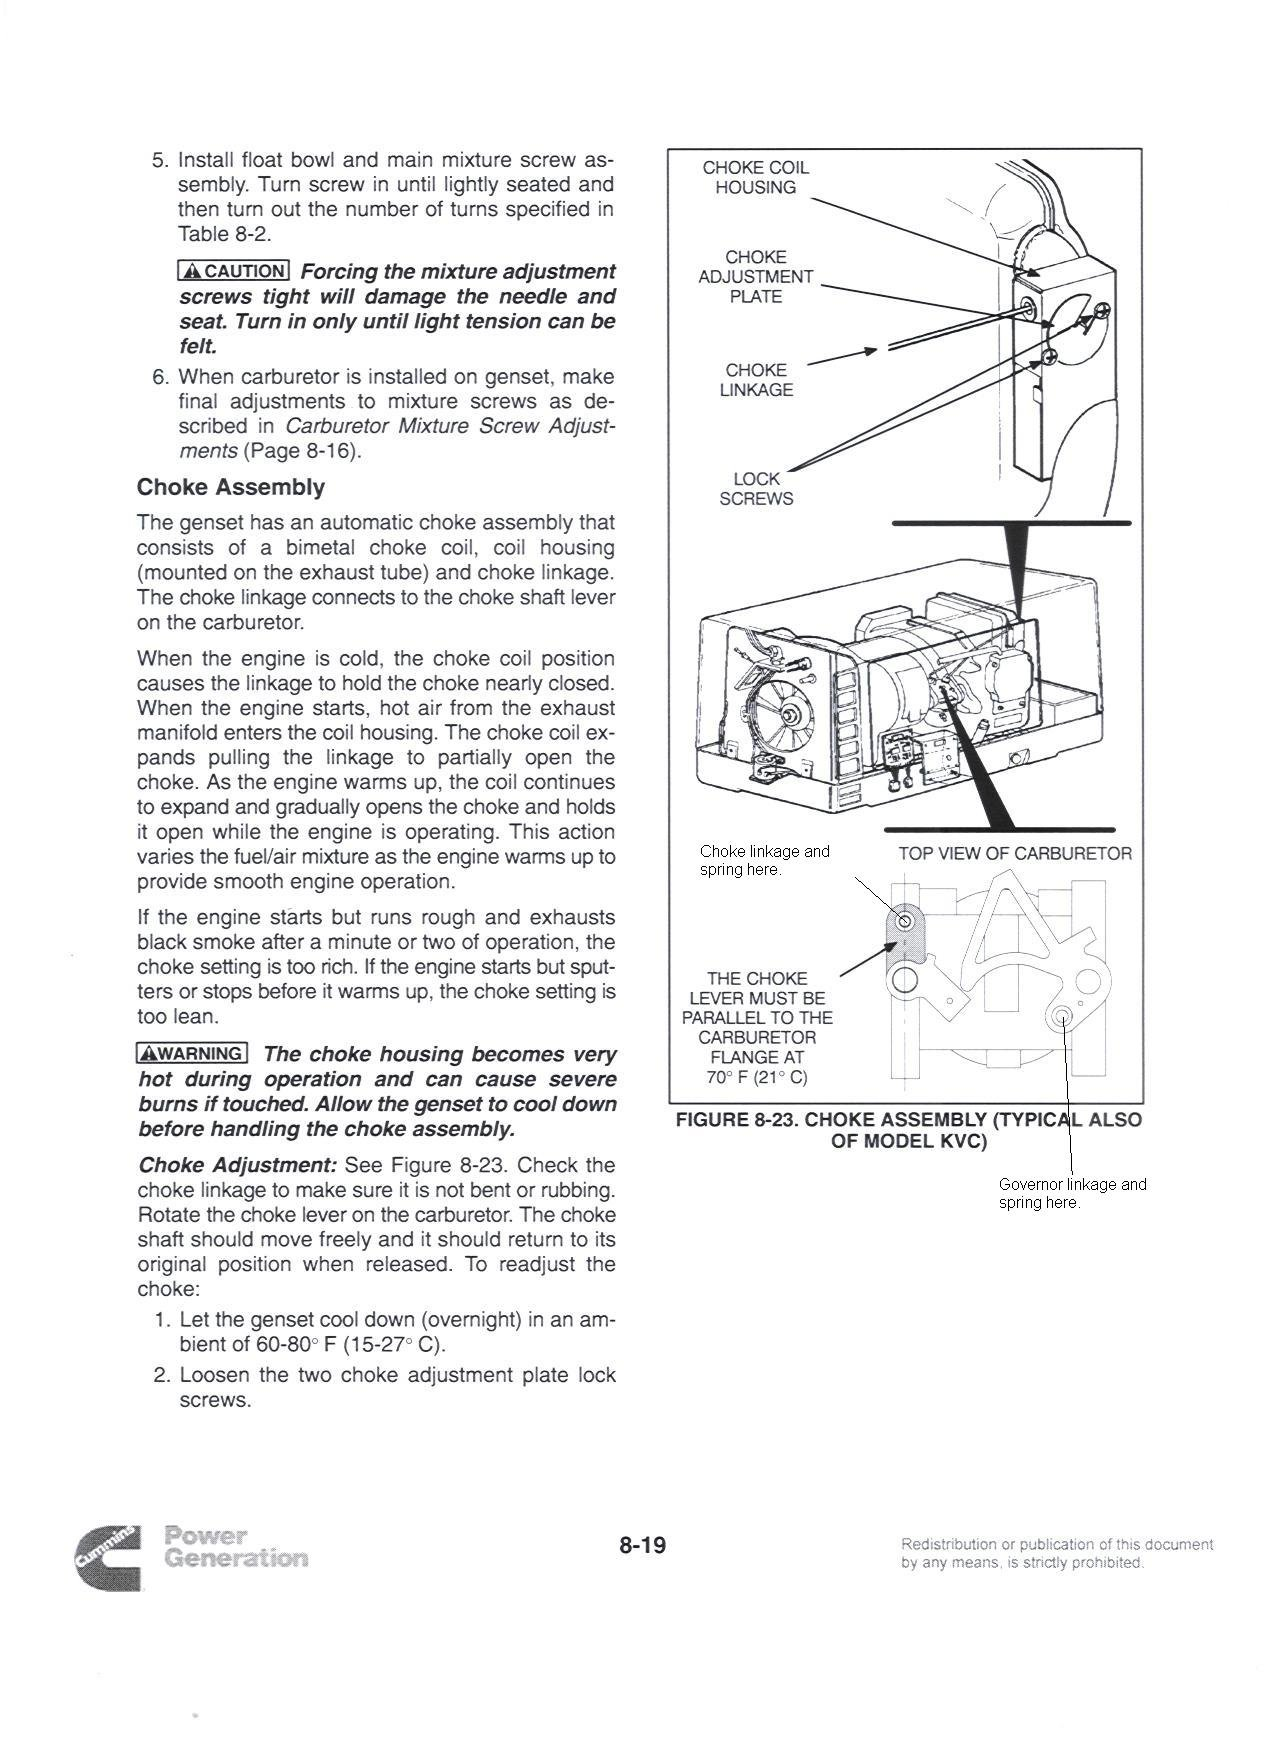 Problems with an Onan 2 8KVFA26100K generator  Upon startup